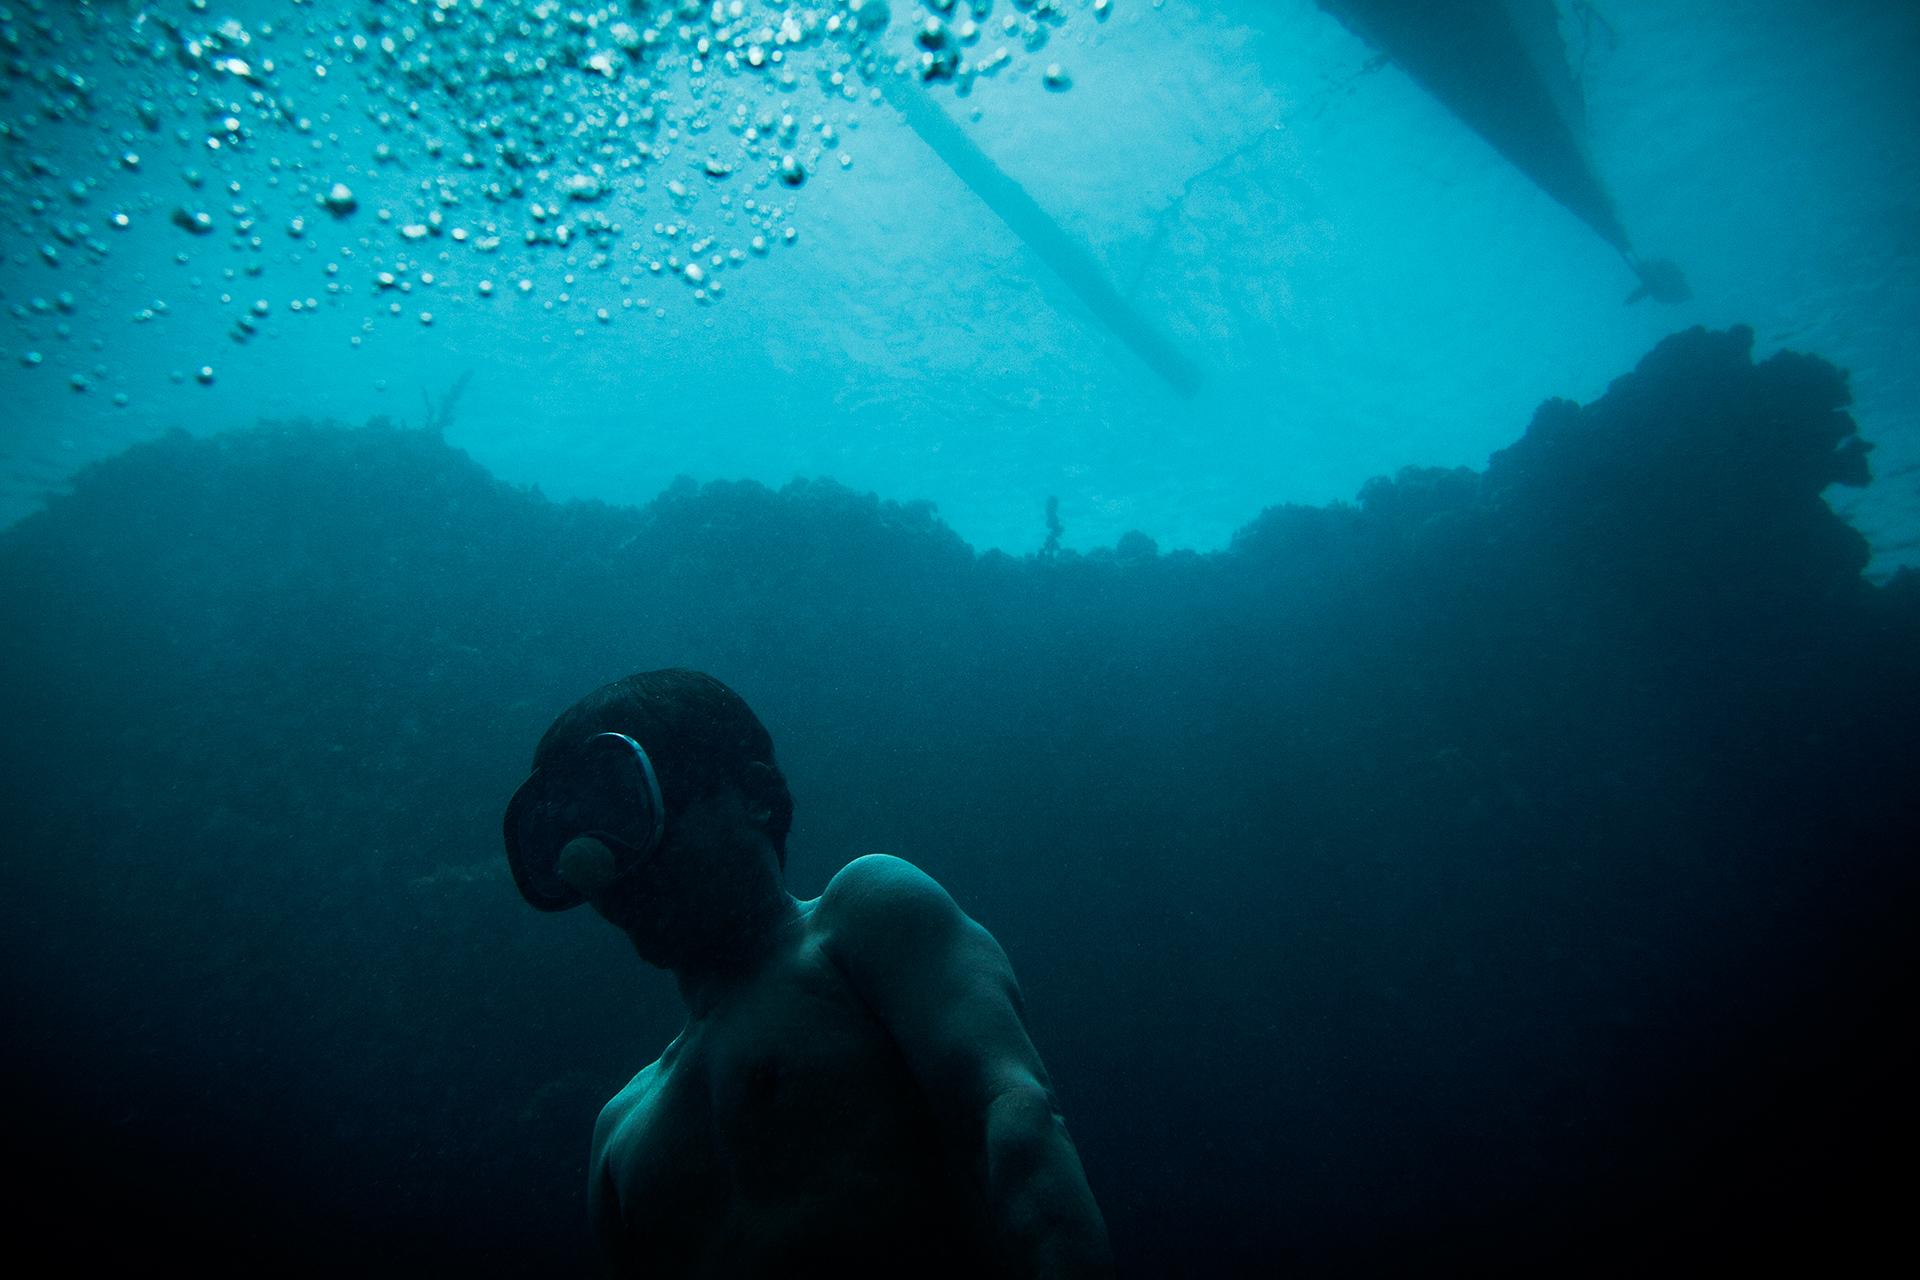 A freediver underwater in Sasa, Davao City